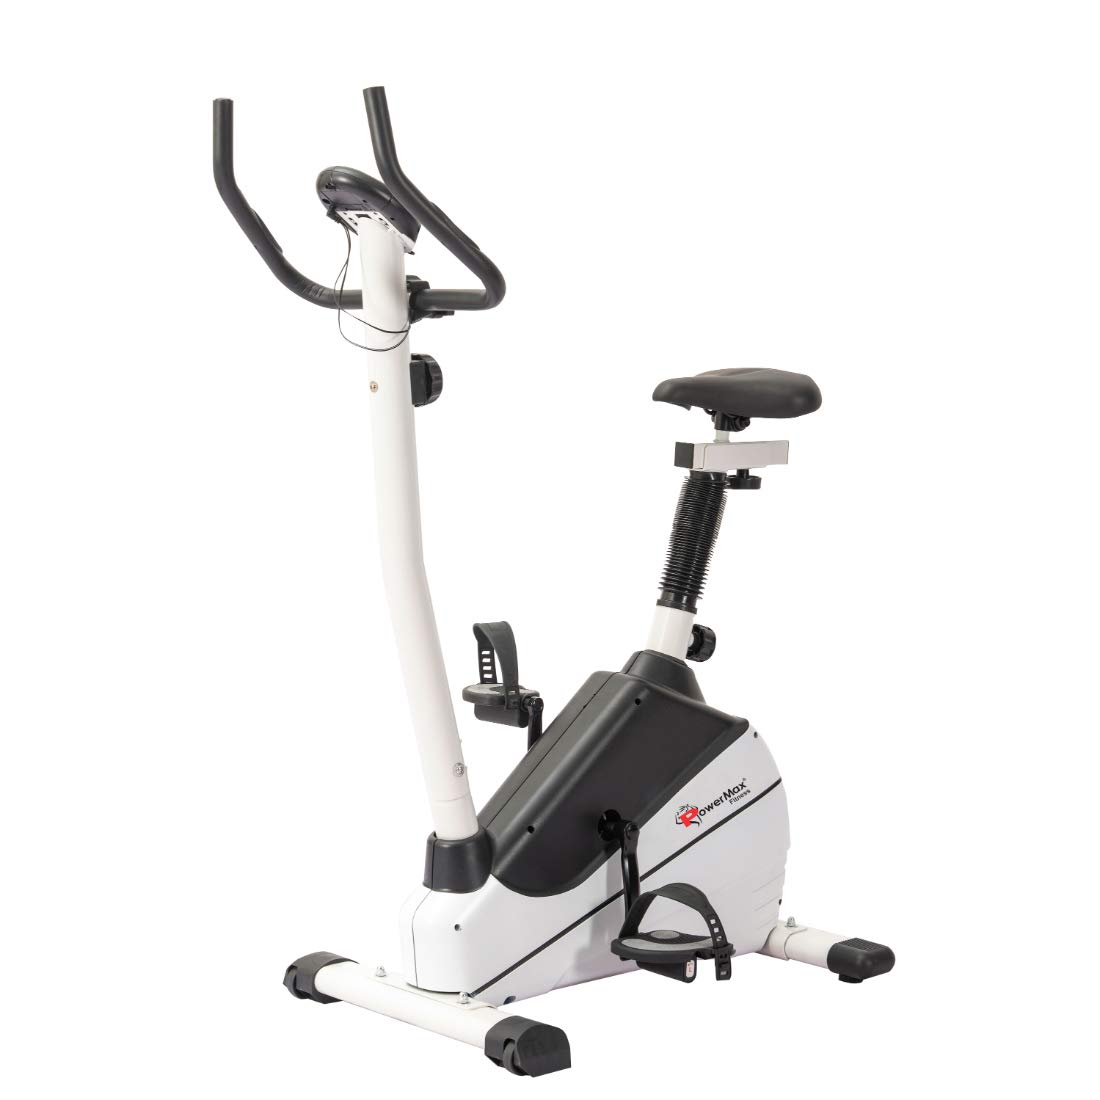 PowerMax Fitness BU-610 Magnetic Exercise Upright Bike